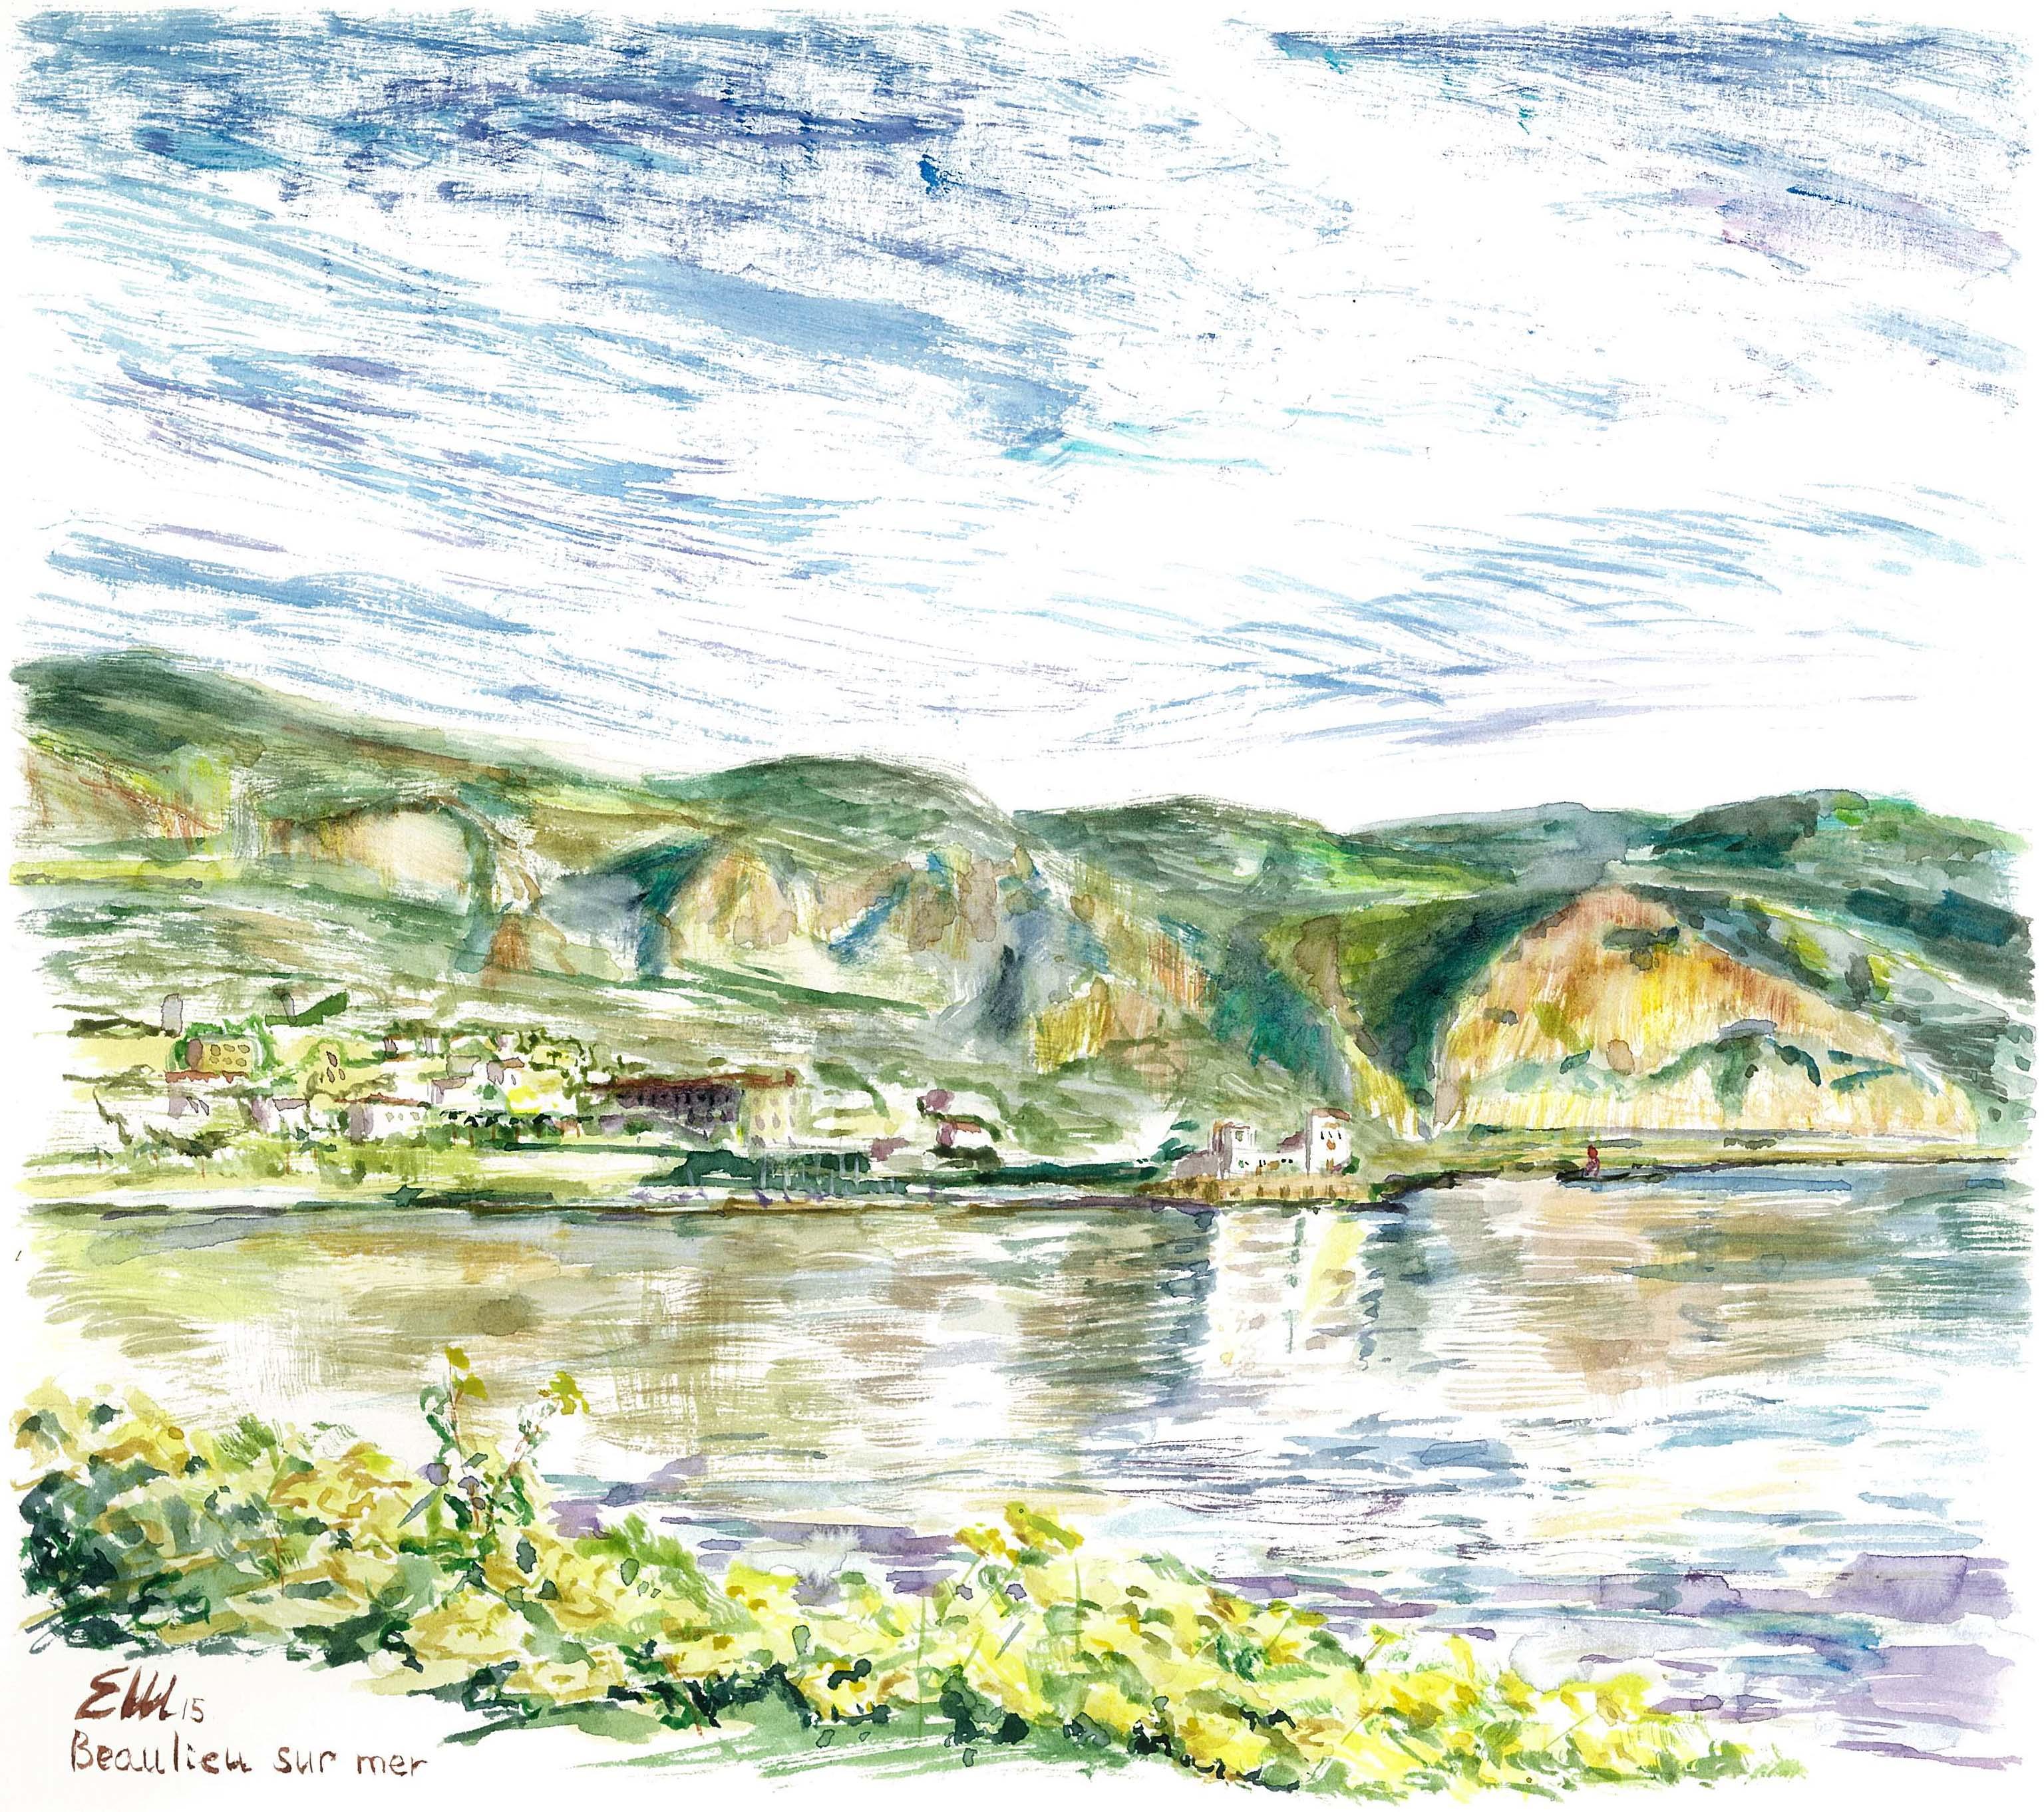 Fourmis bay